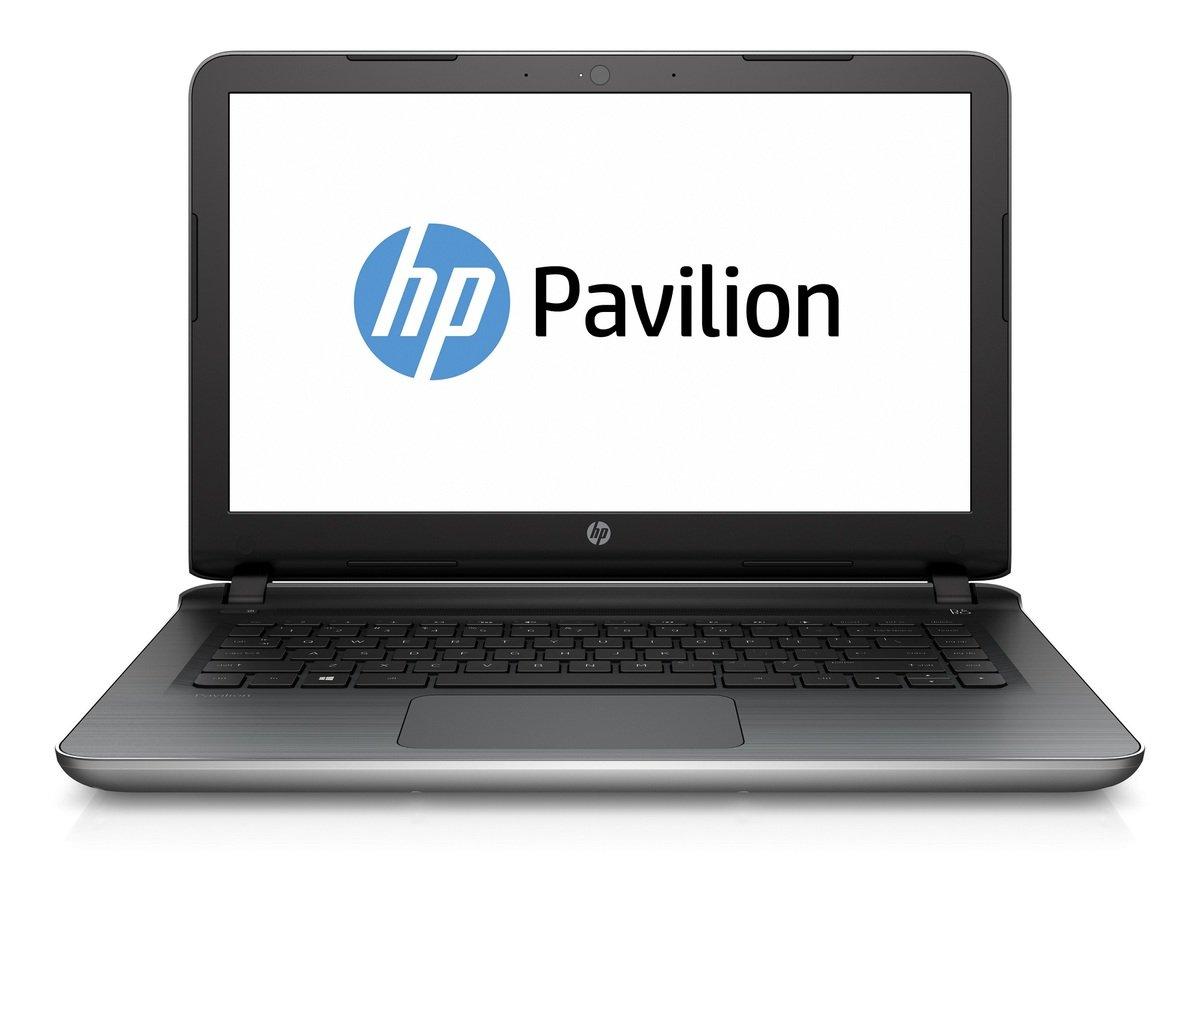 Pavilion 14-ab148TX 筆記簿型電腦